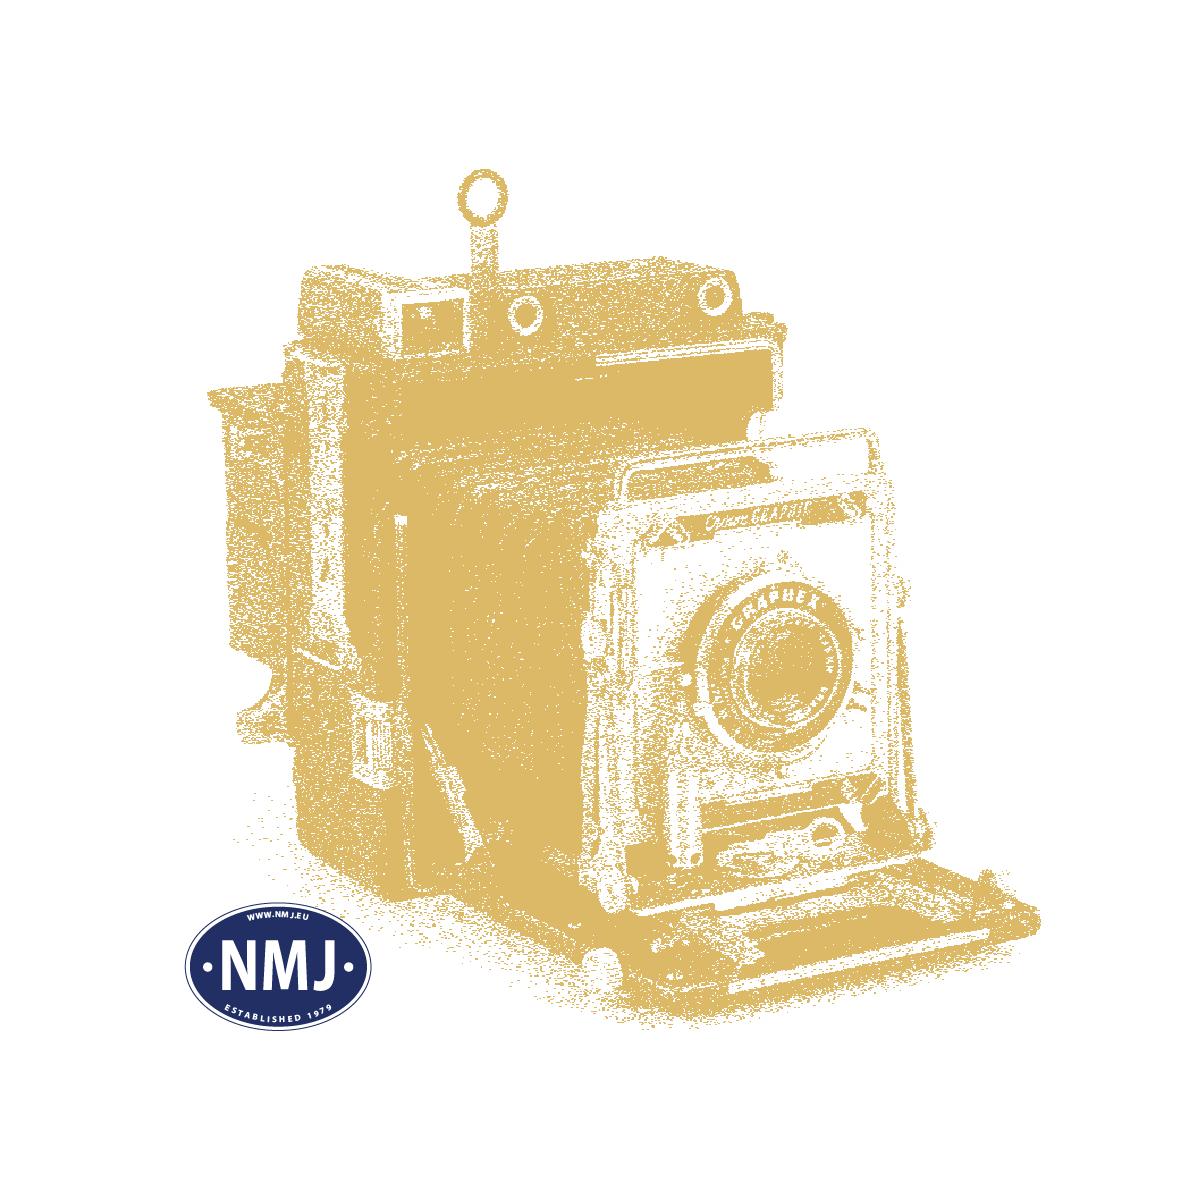 NMJT95302 - NMJ Topline CFL 1603 (1956-1971), AC Digital